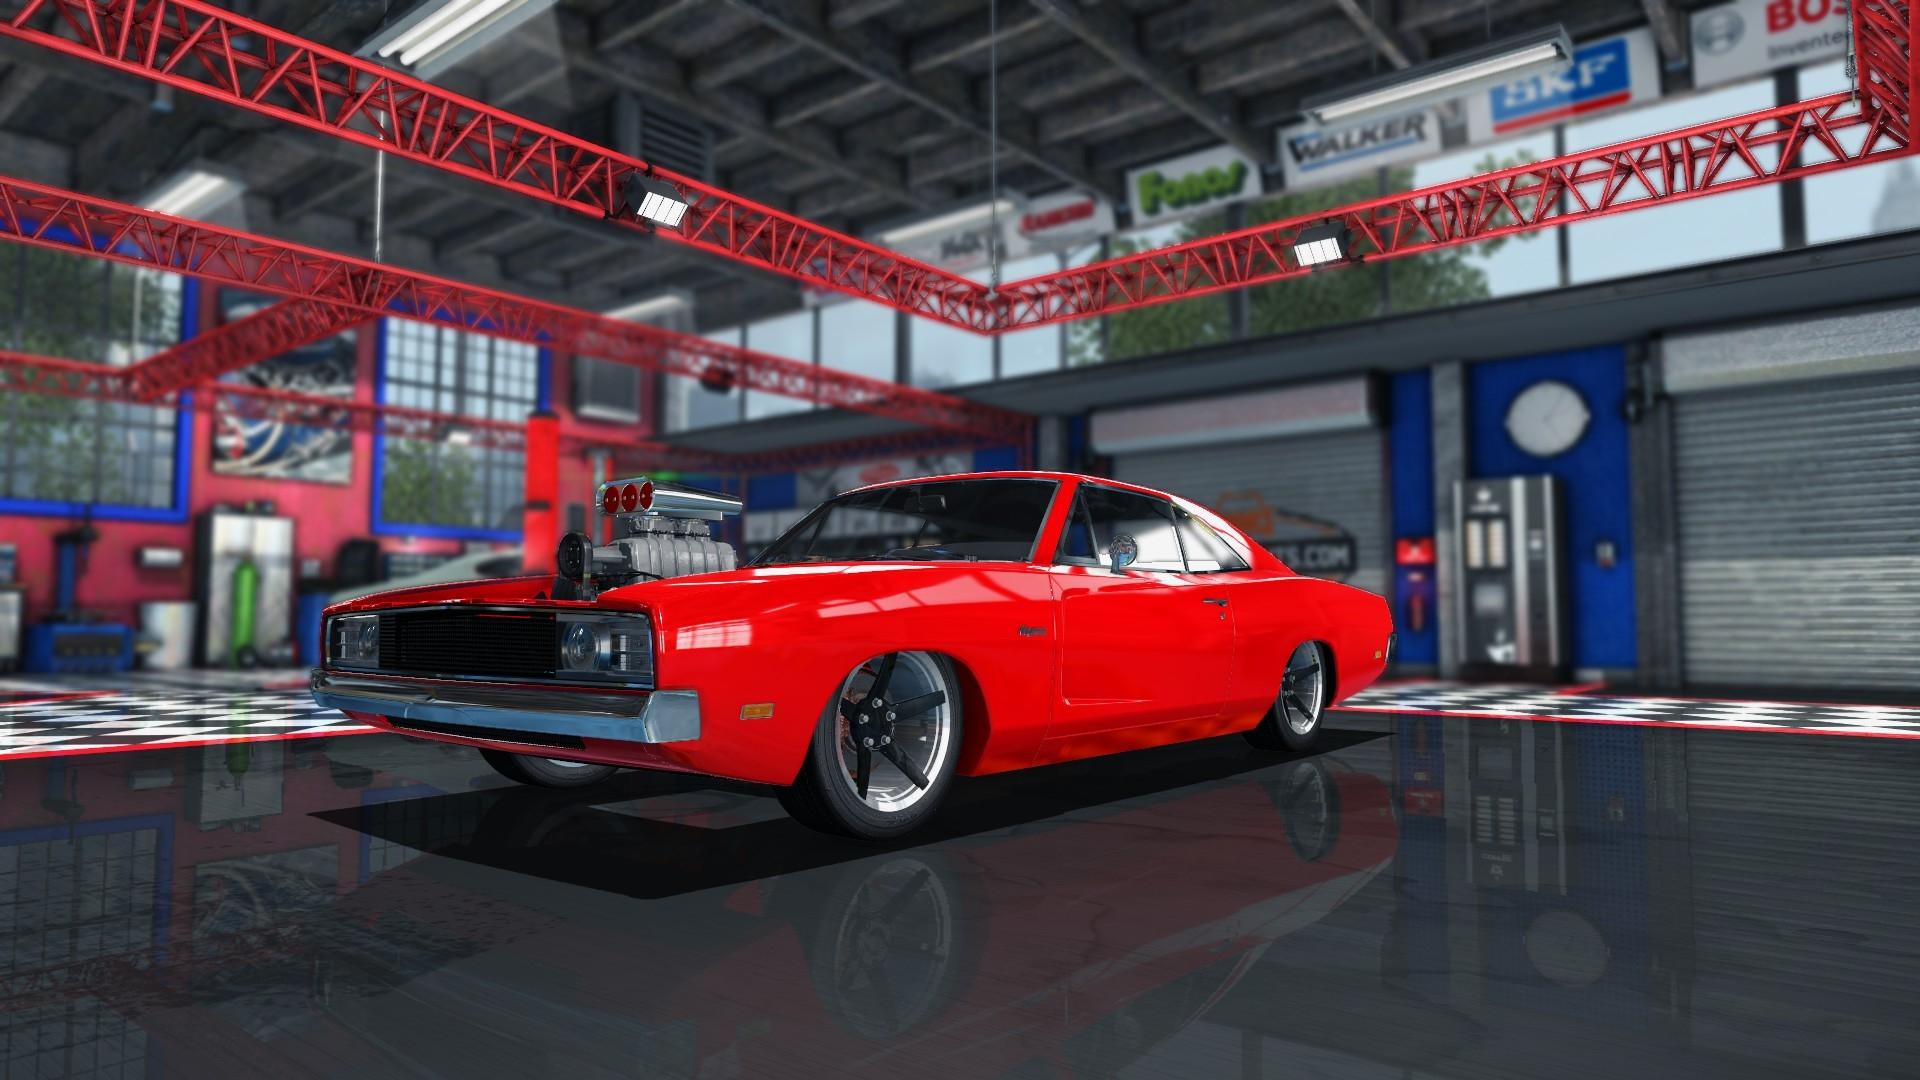 Car Mechanic Simulator 2015 Mac - CD Keys for Steam, Uplay